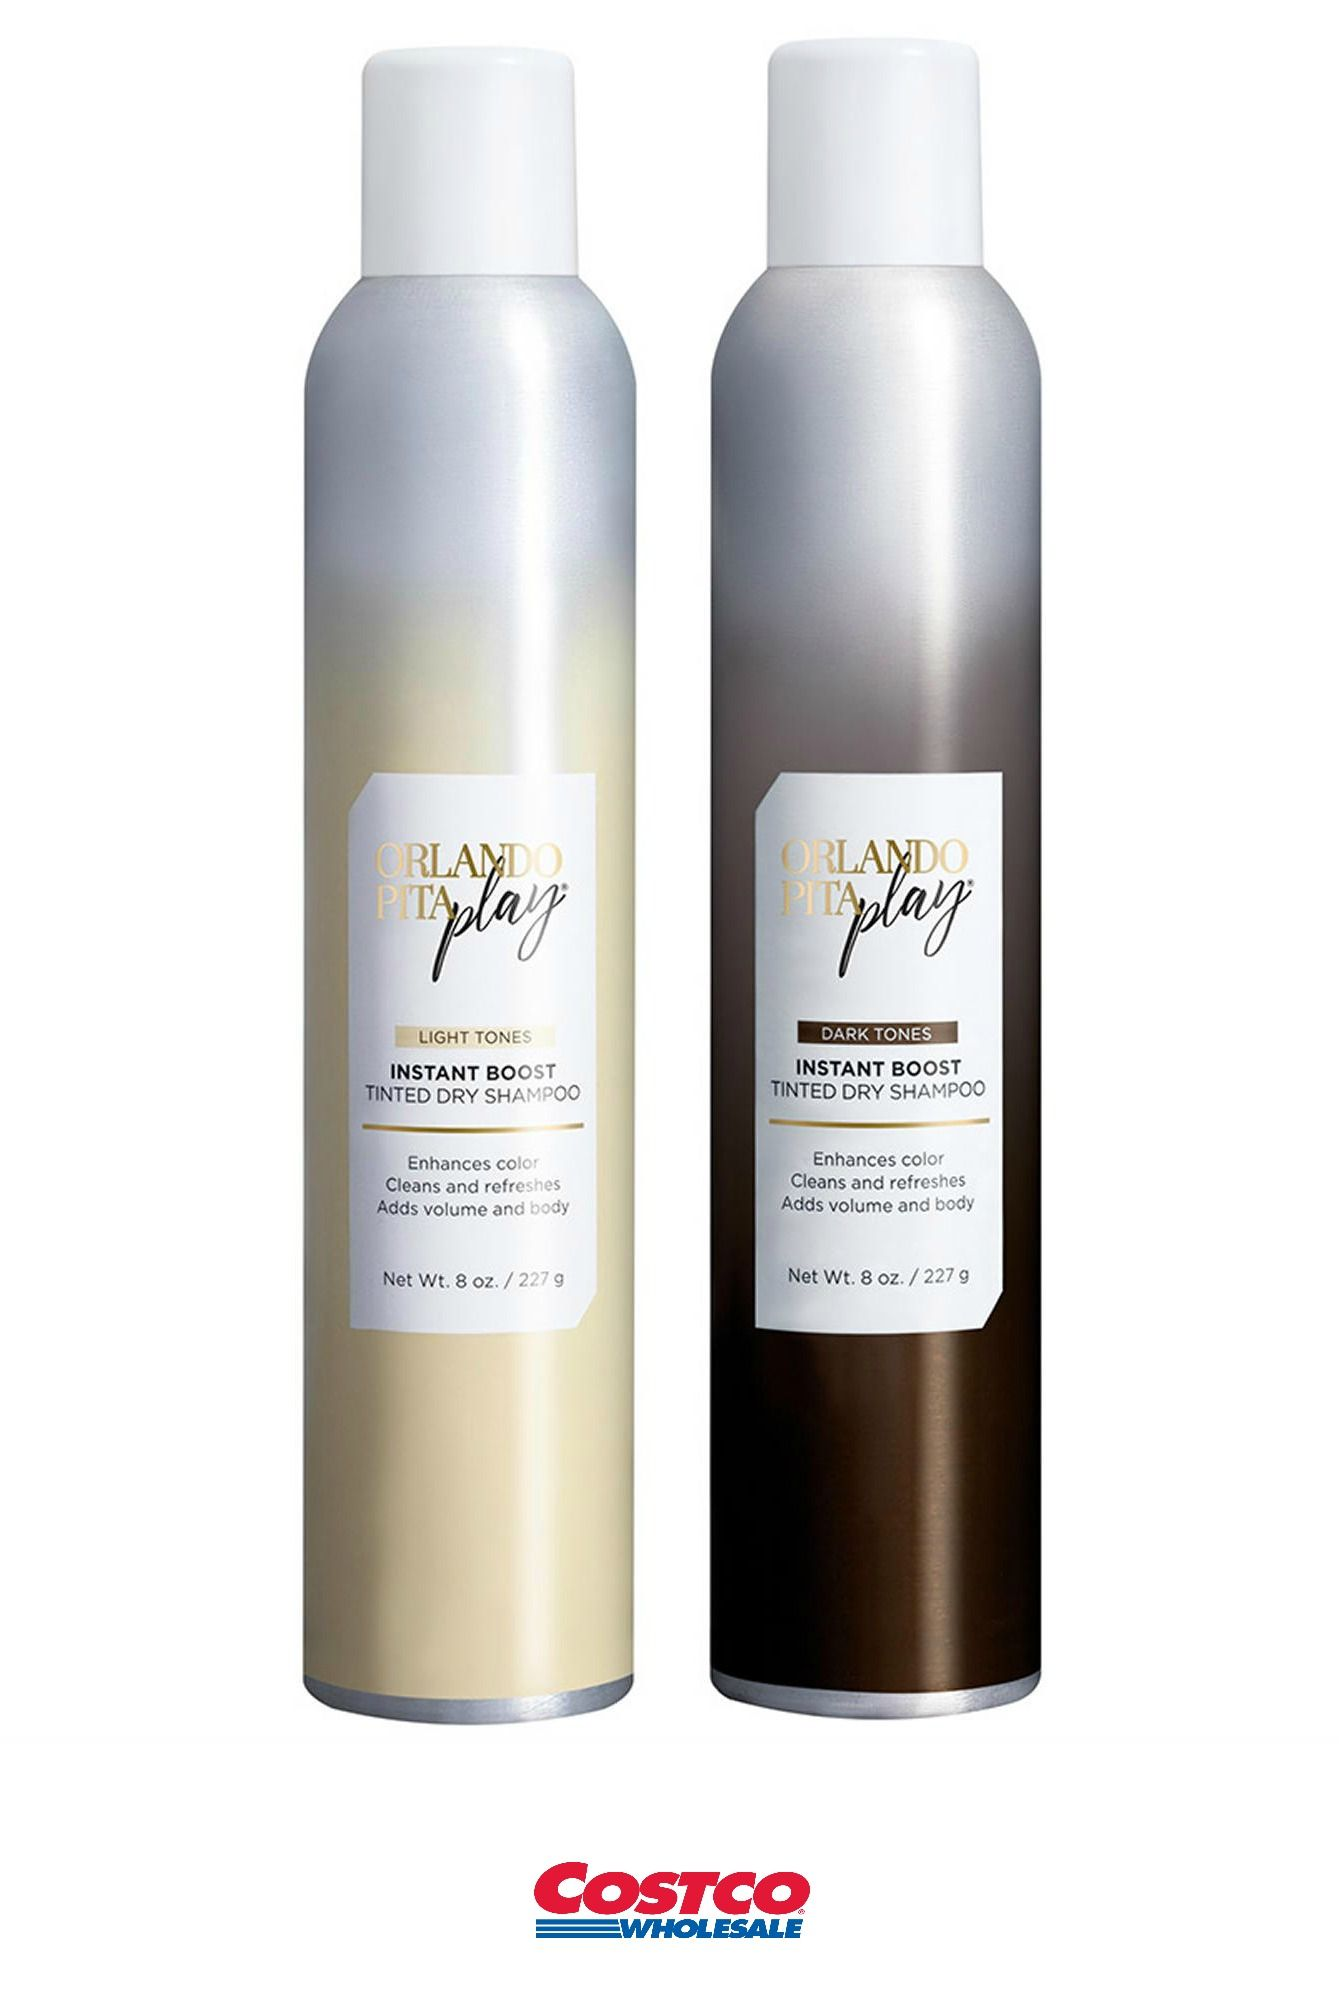 Orlando Pita Play Tinted Shampoo Shampoo Dry Shampoo Shampoo Bottle